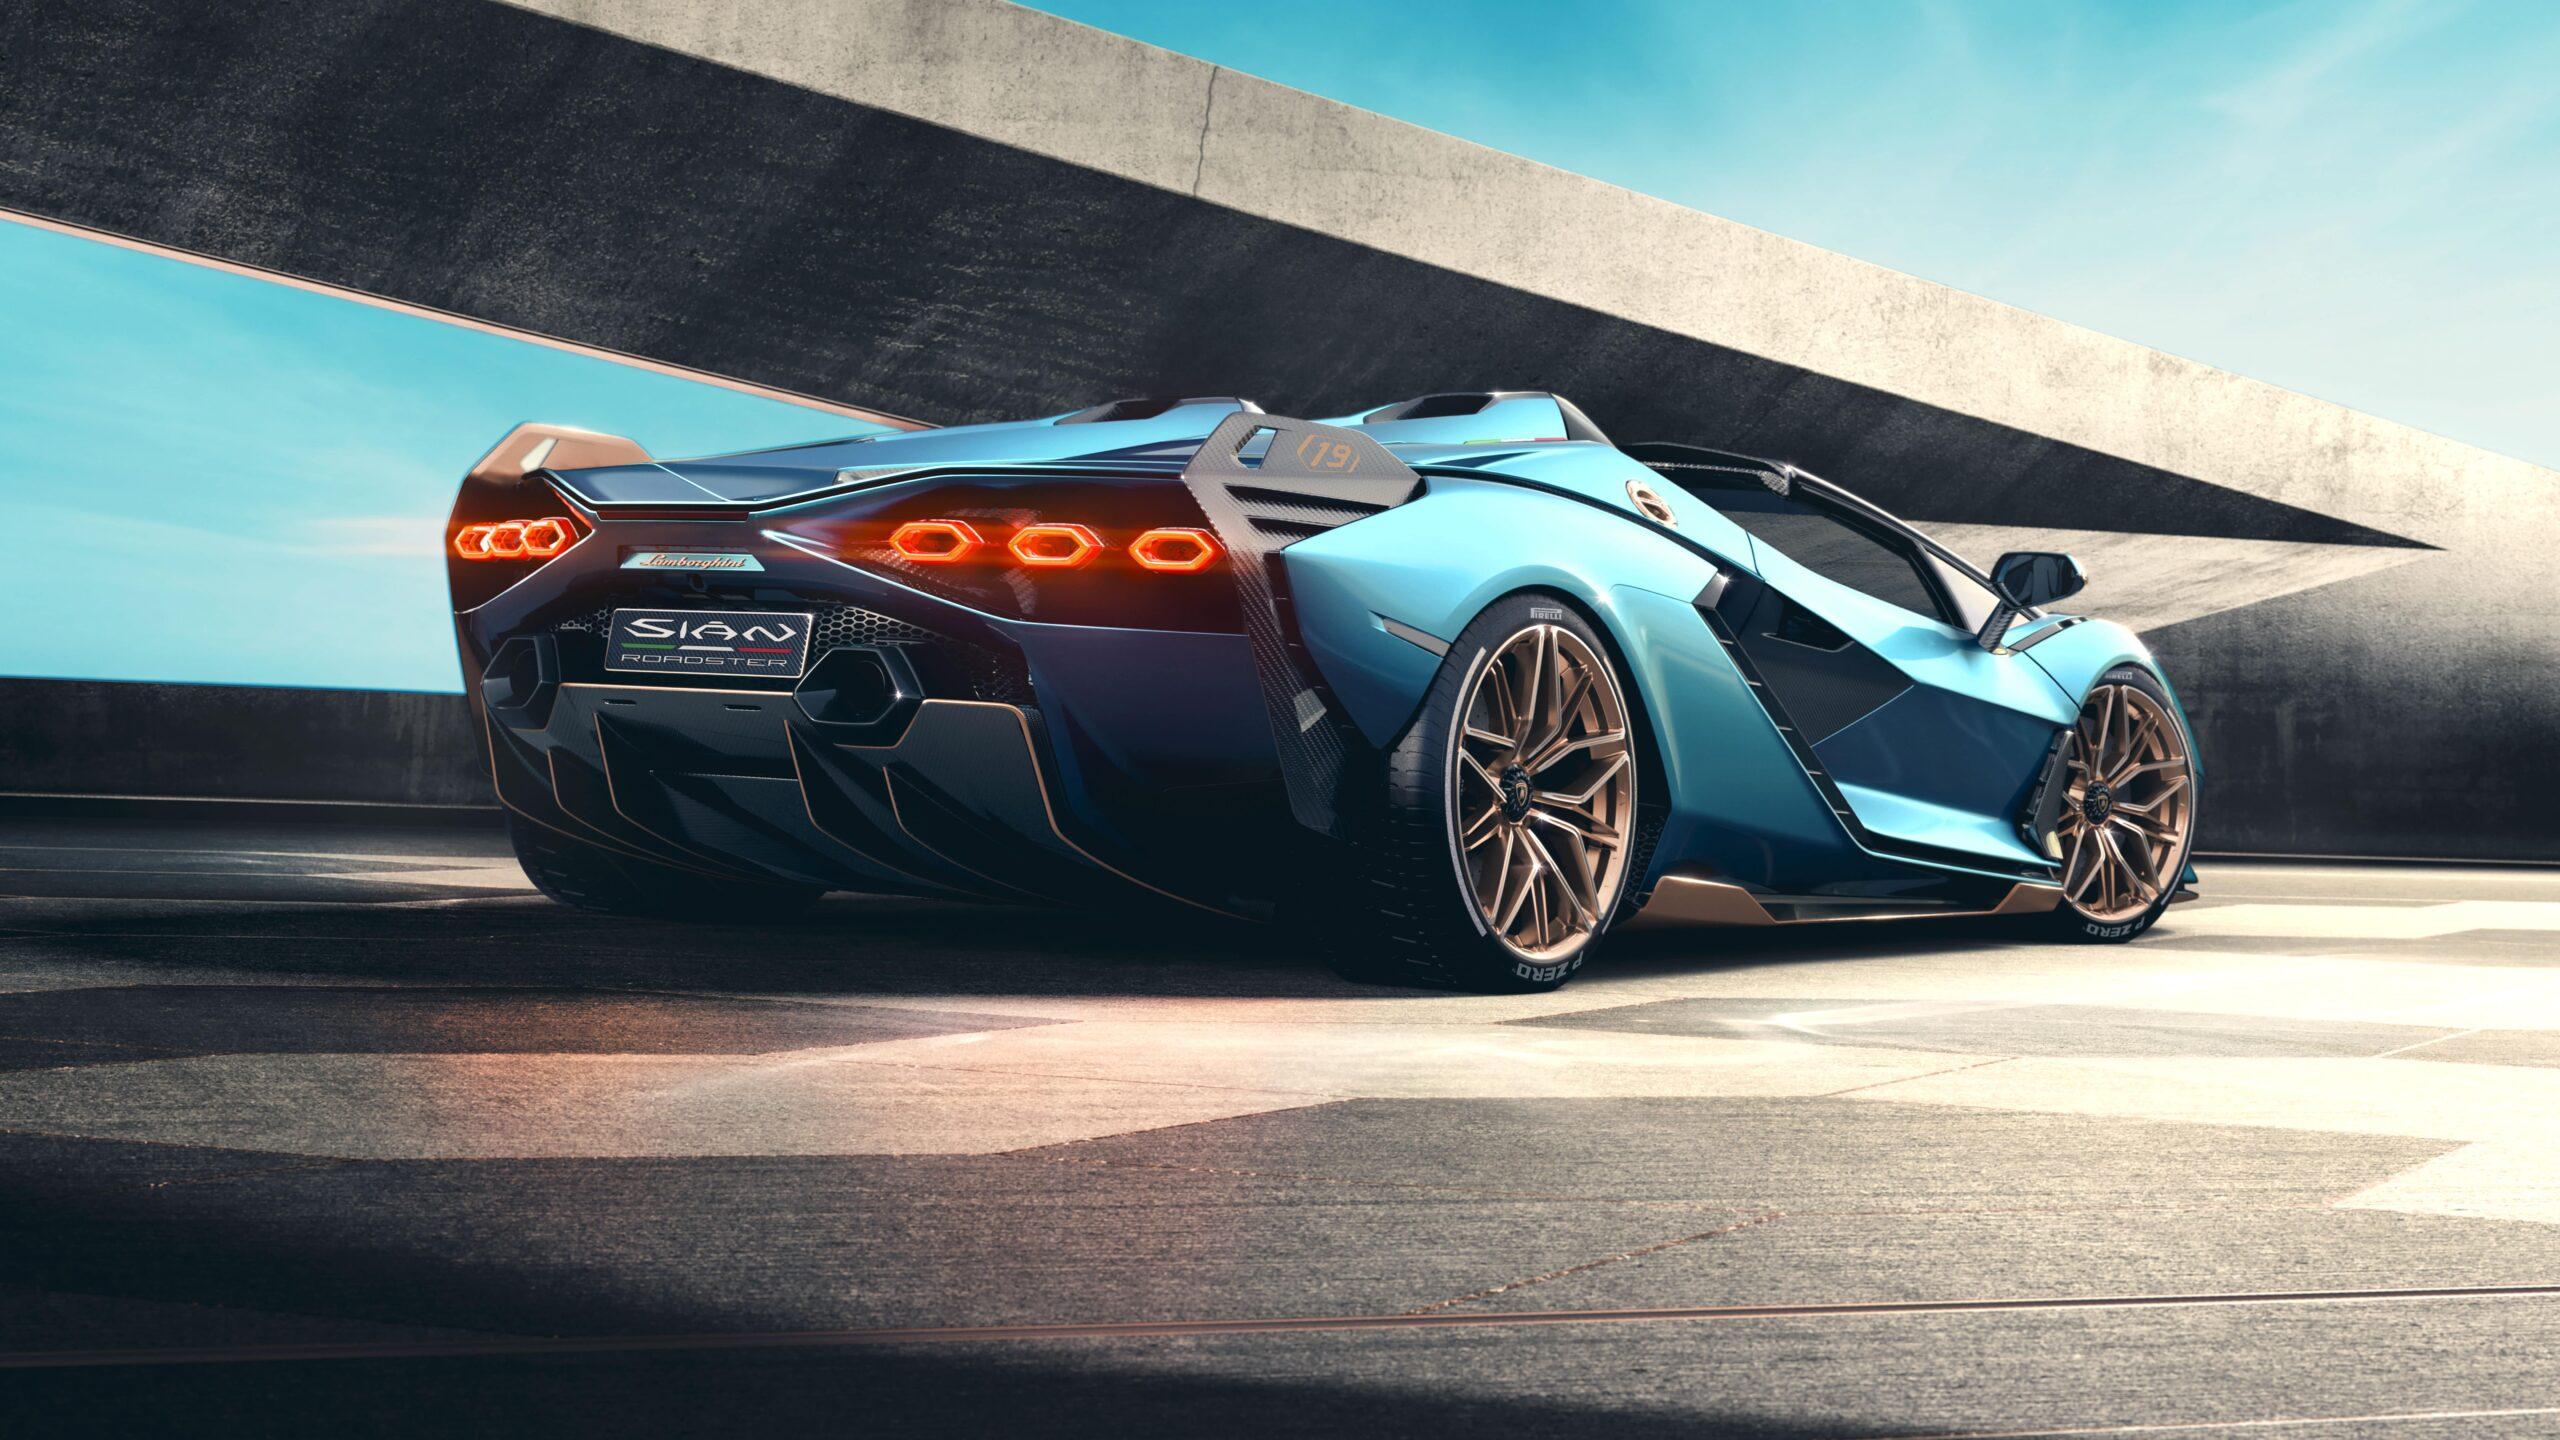 Lamborghini Siàn Roadster Rear